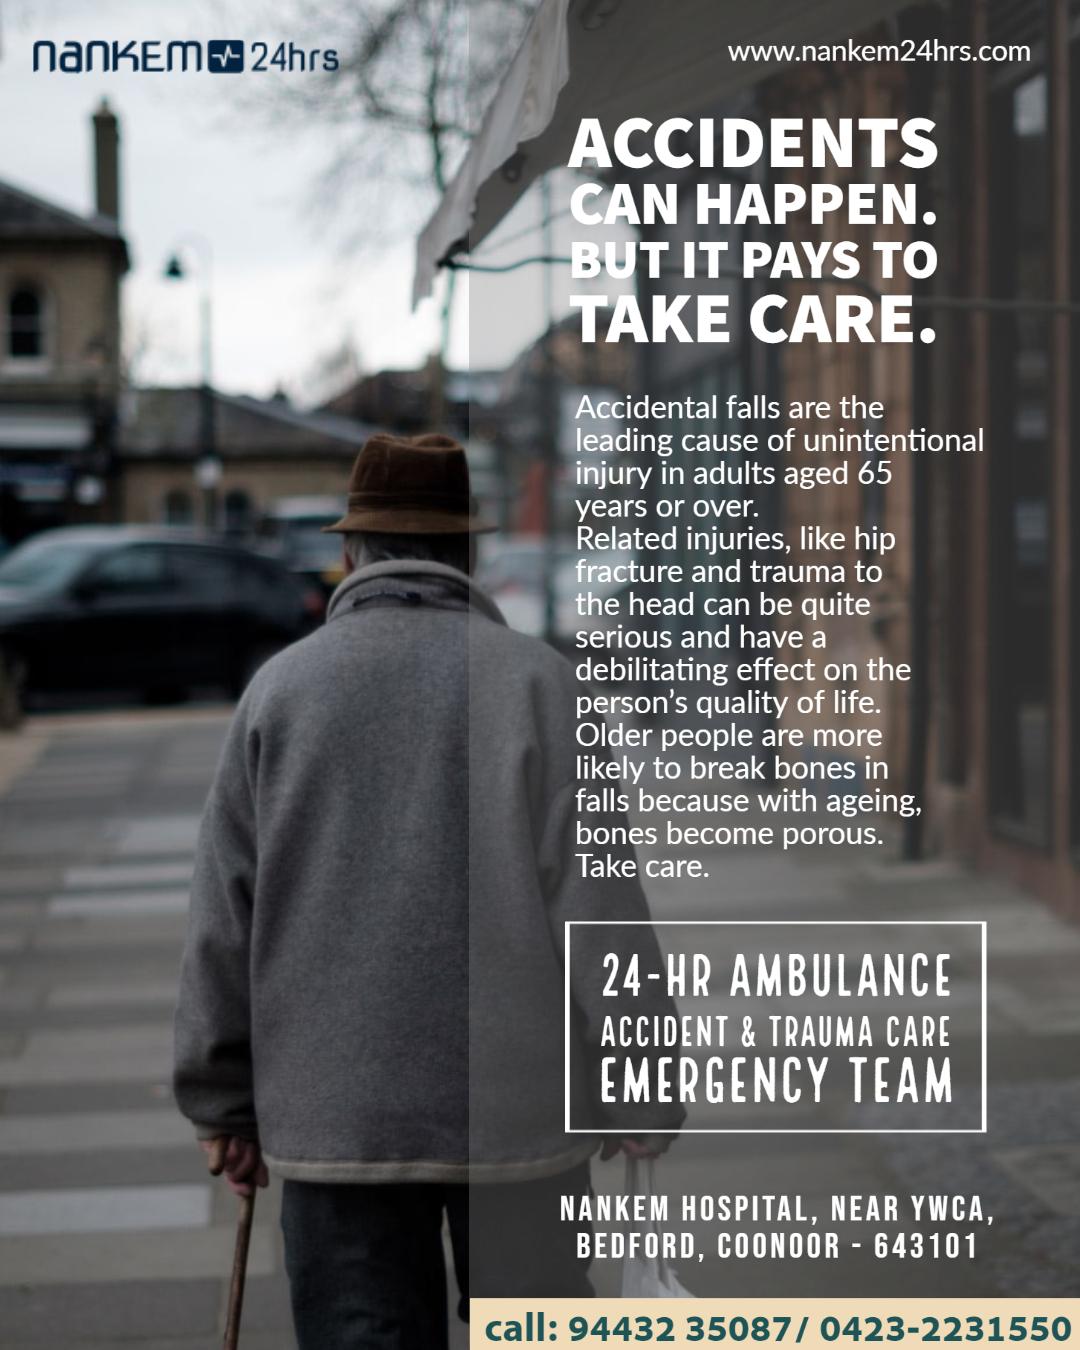 nankem ad - elder care